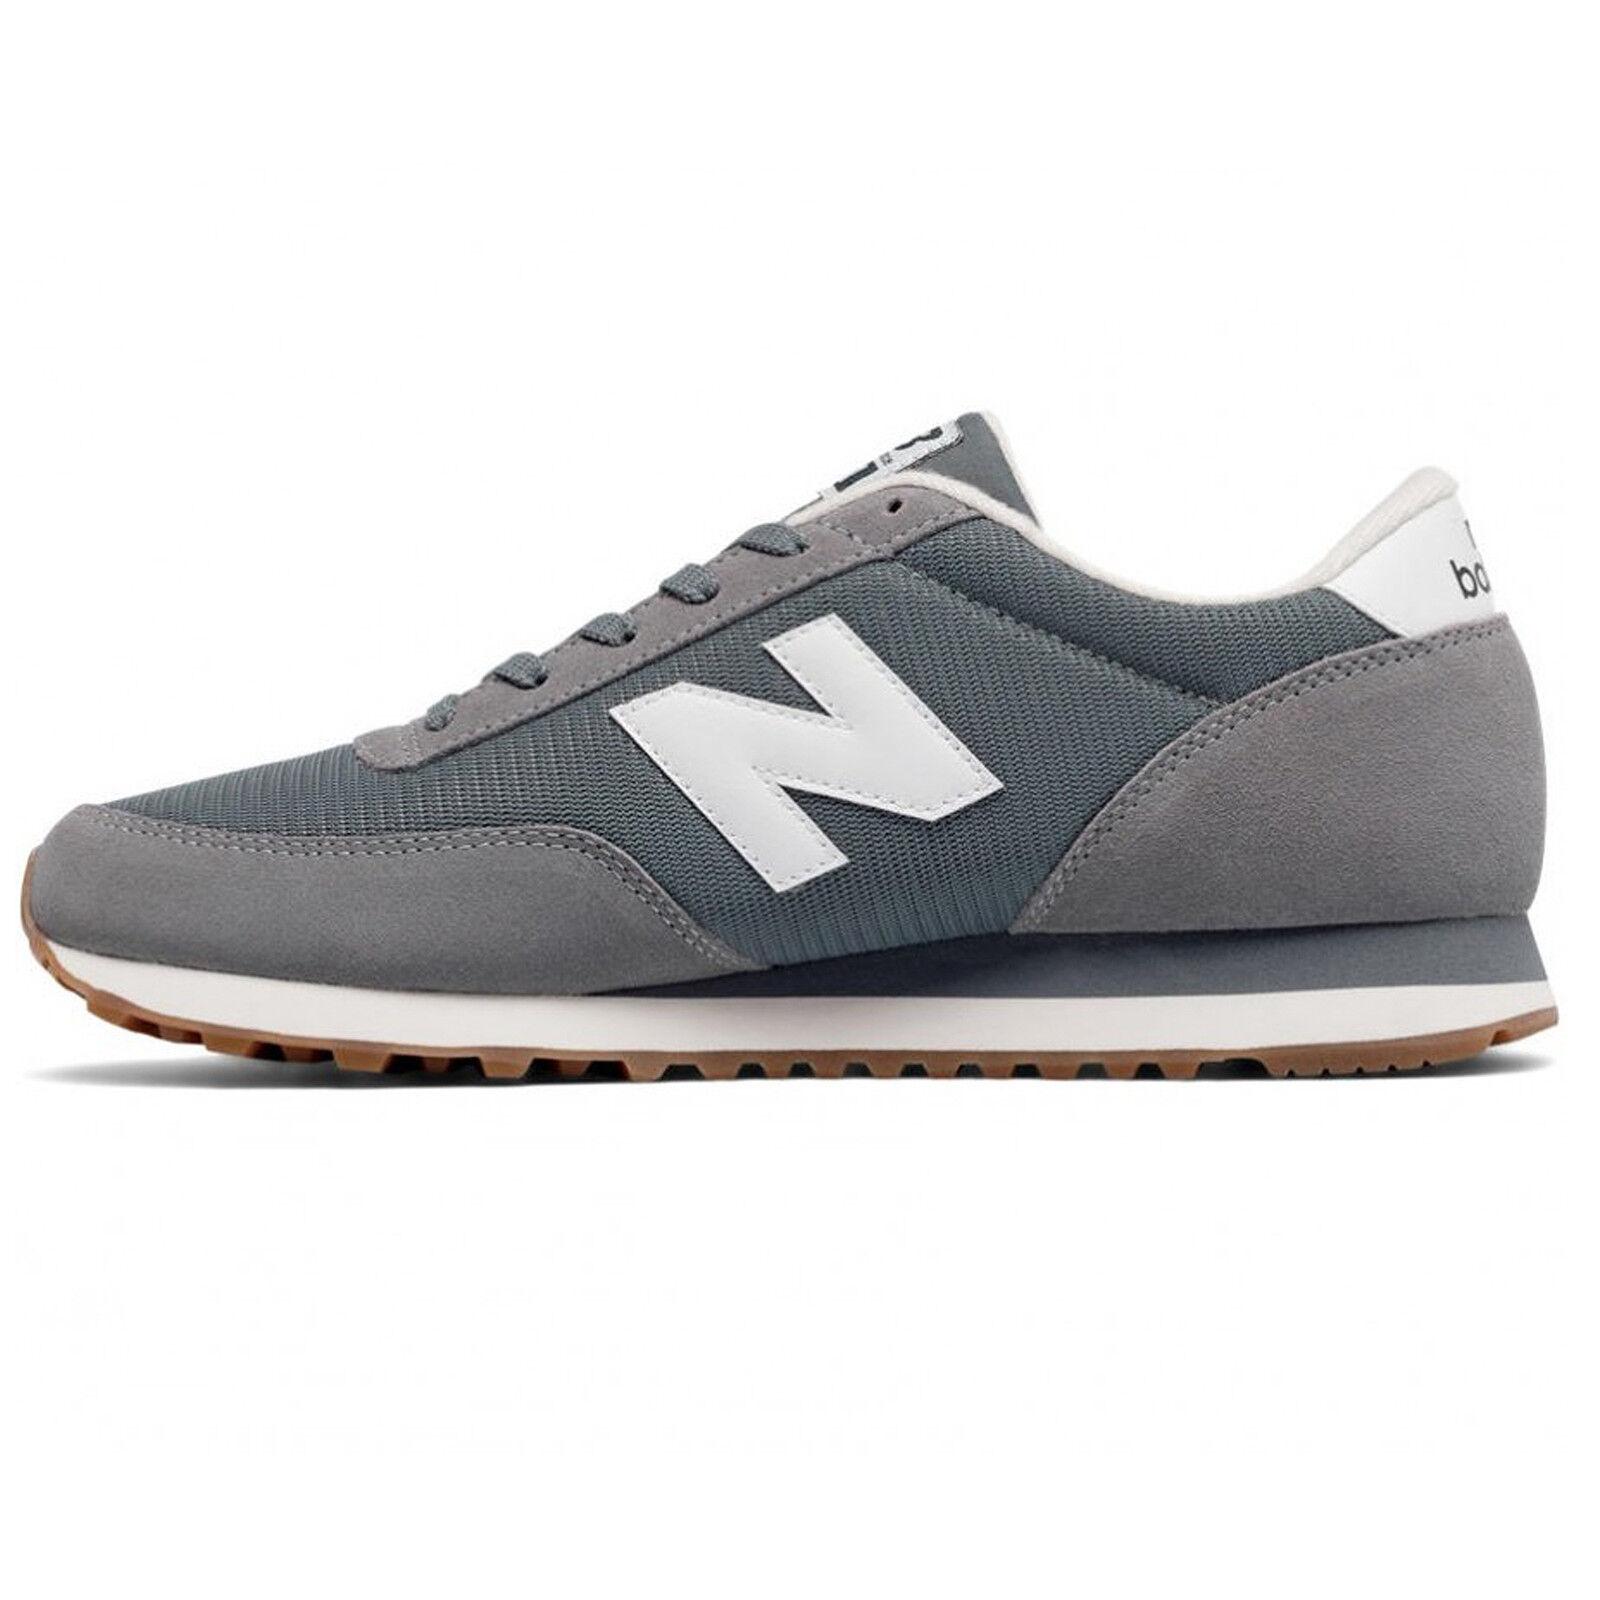 Venta de liquidación de temporada New balance ml501cva cortos ocio zapato